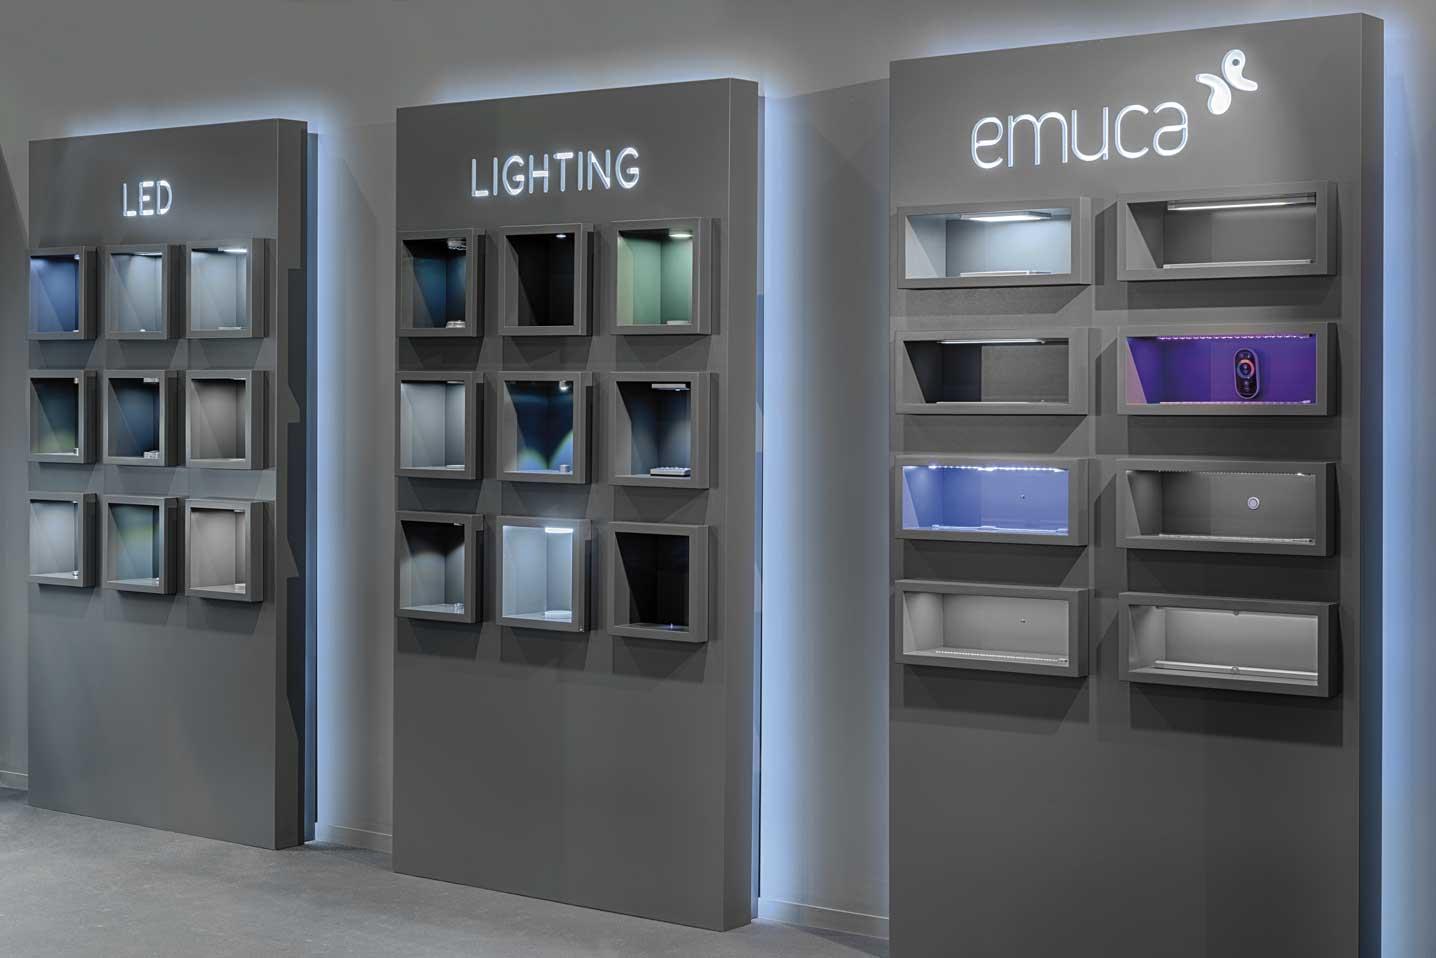 iluminacion-led-emuca